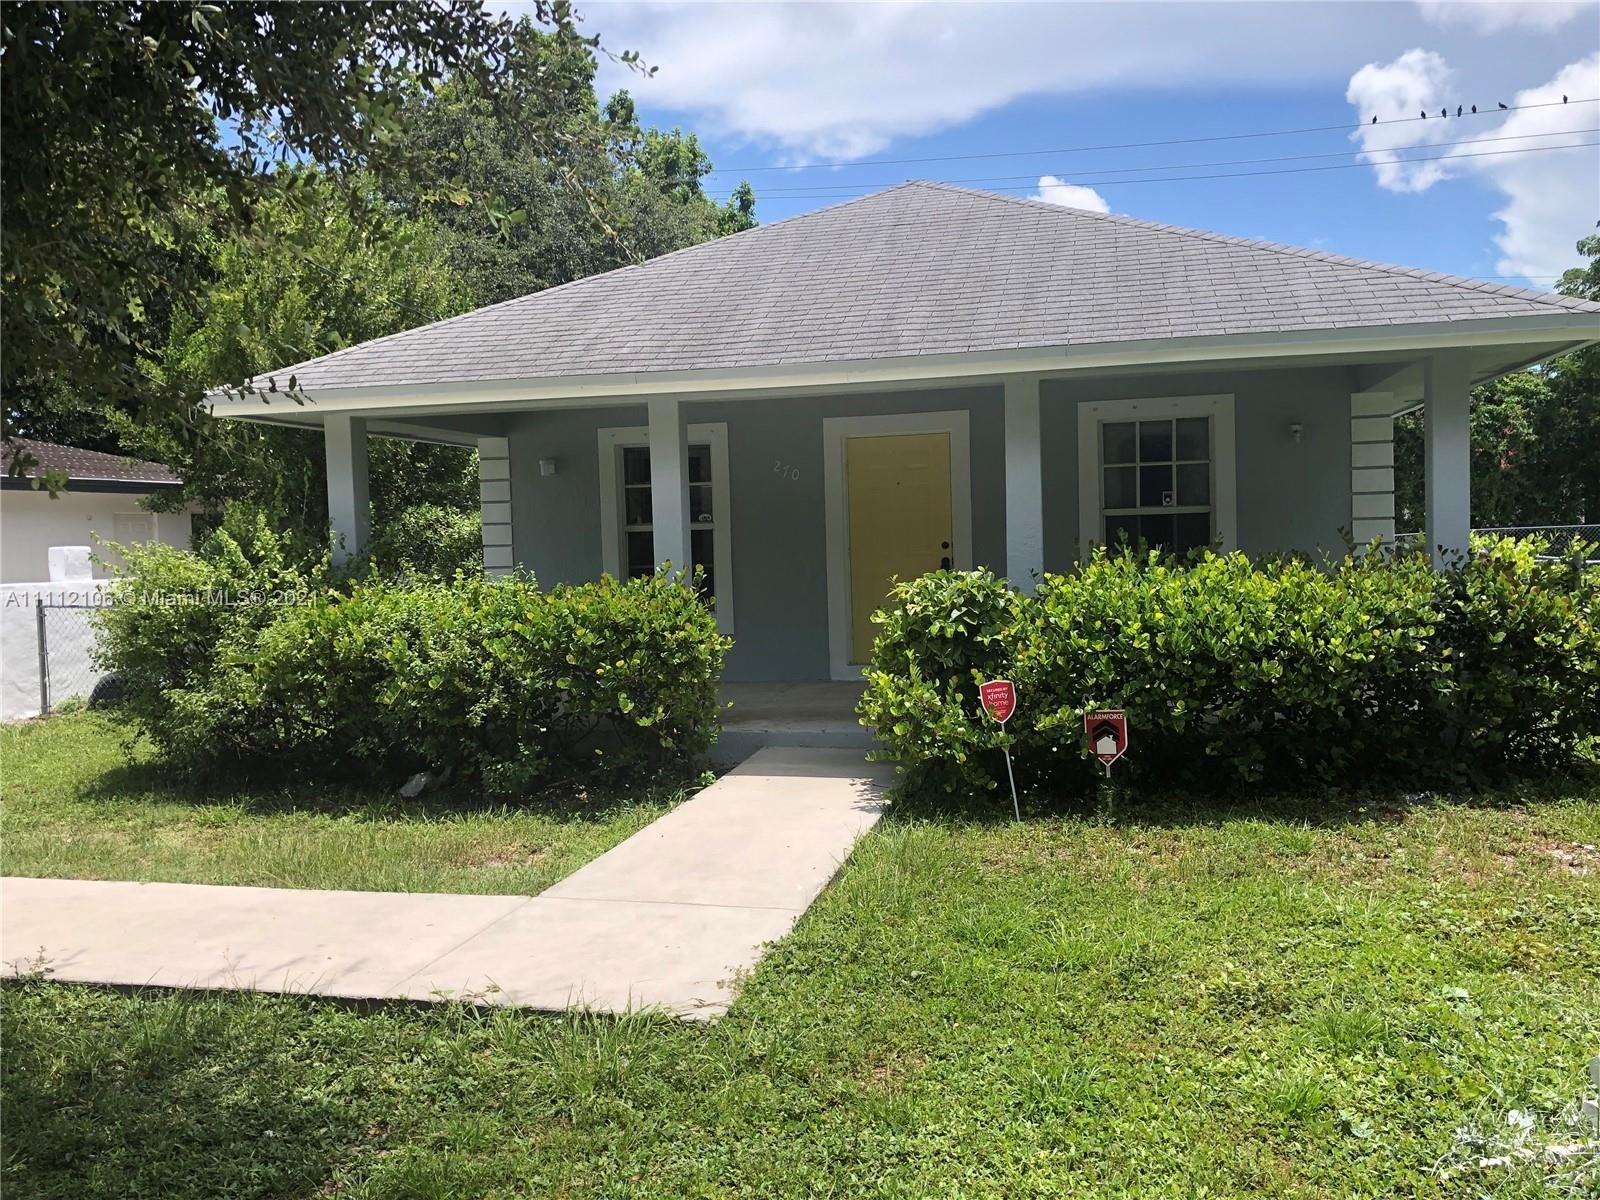 Photo of 270 NW 41st St, Miami, FL 33127 (MLS # A11112106)